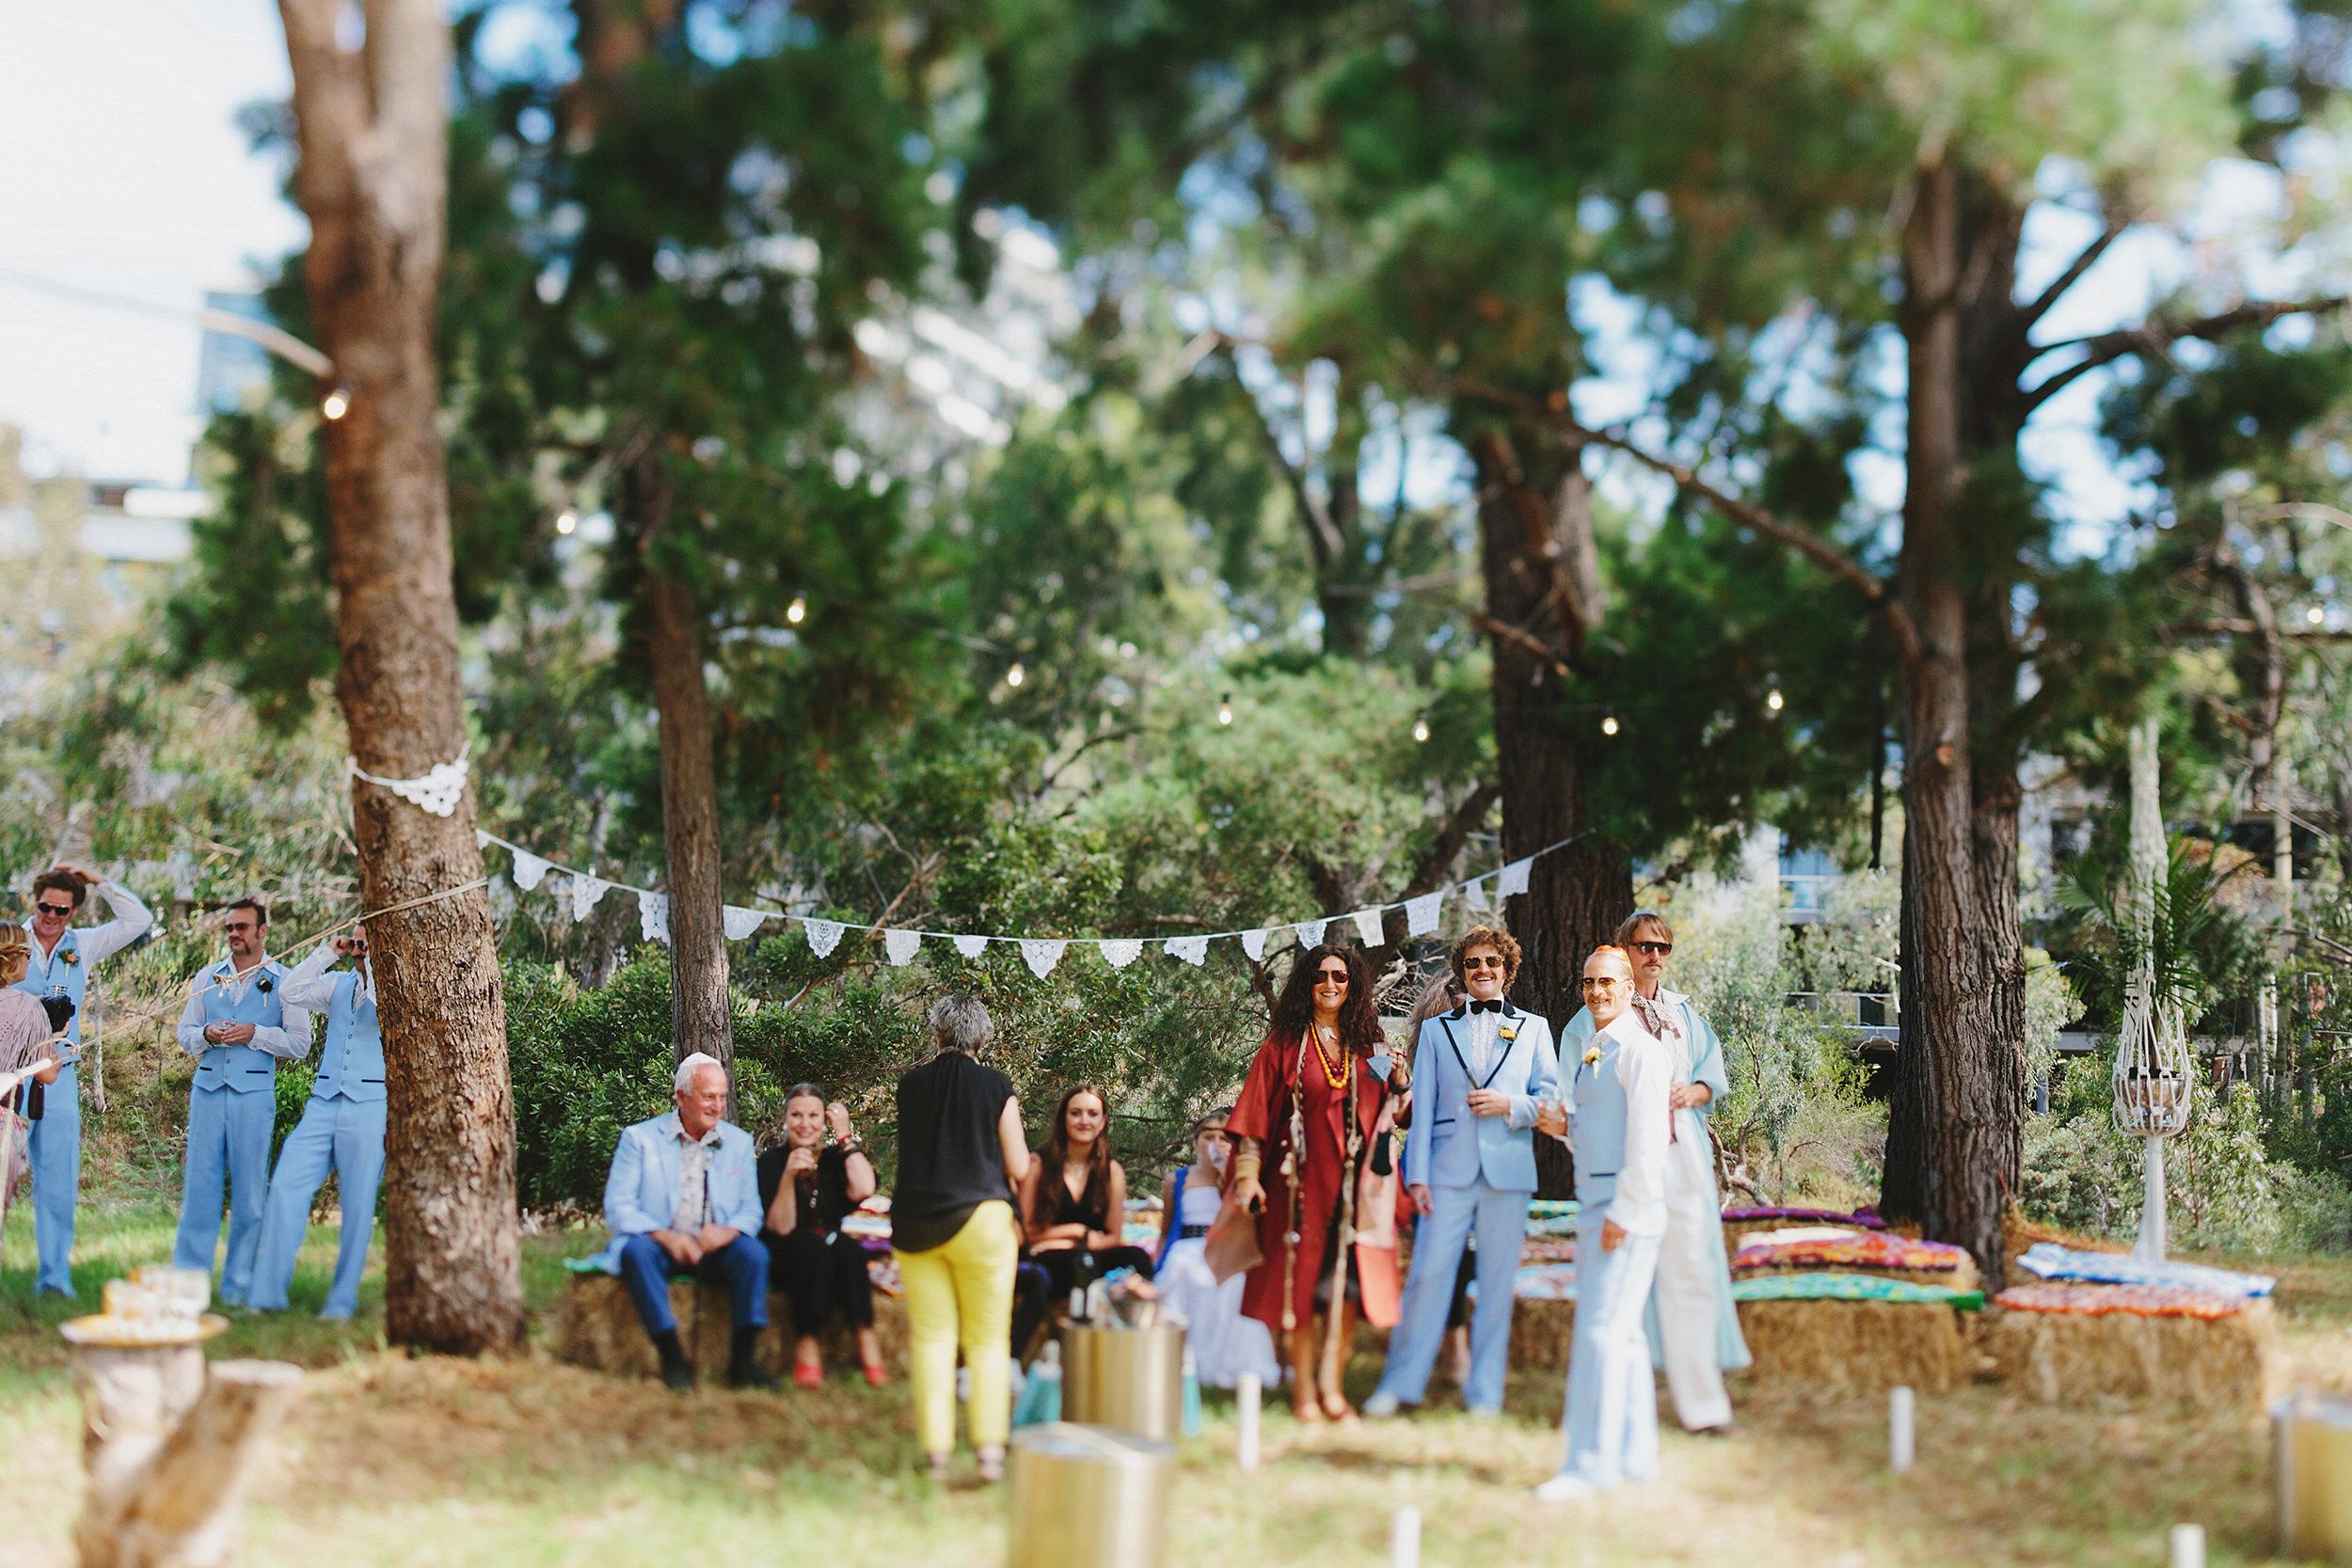 Melbourne_Vintage_Backyard_Wedding_Ben_Erin 013.JPG